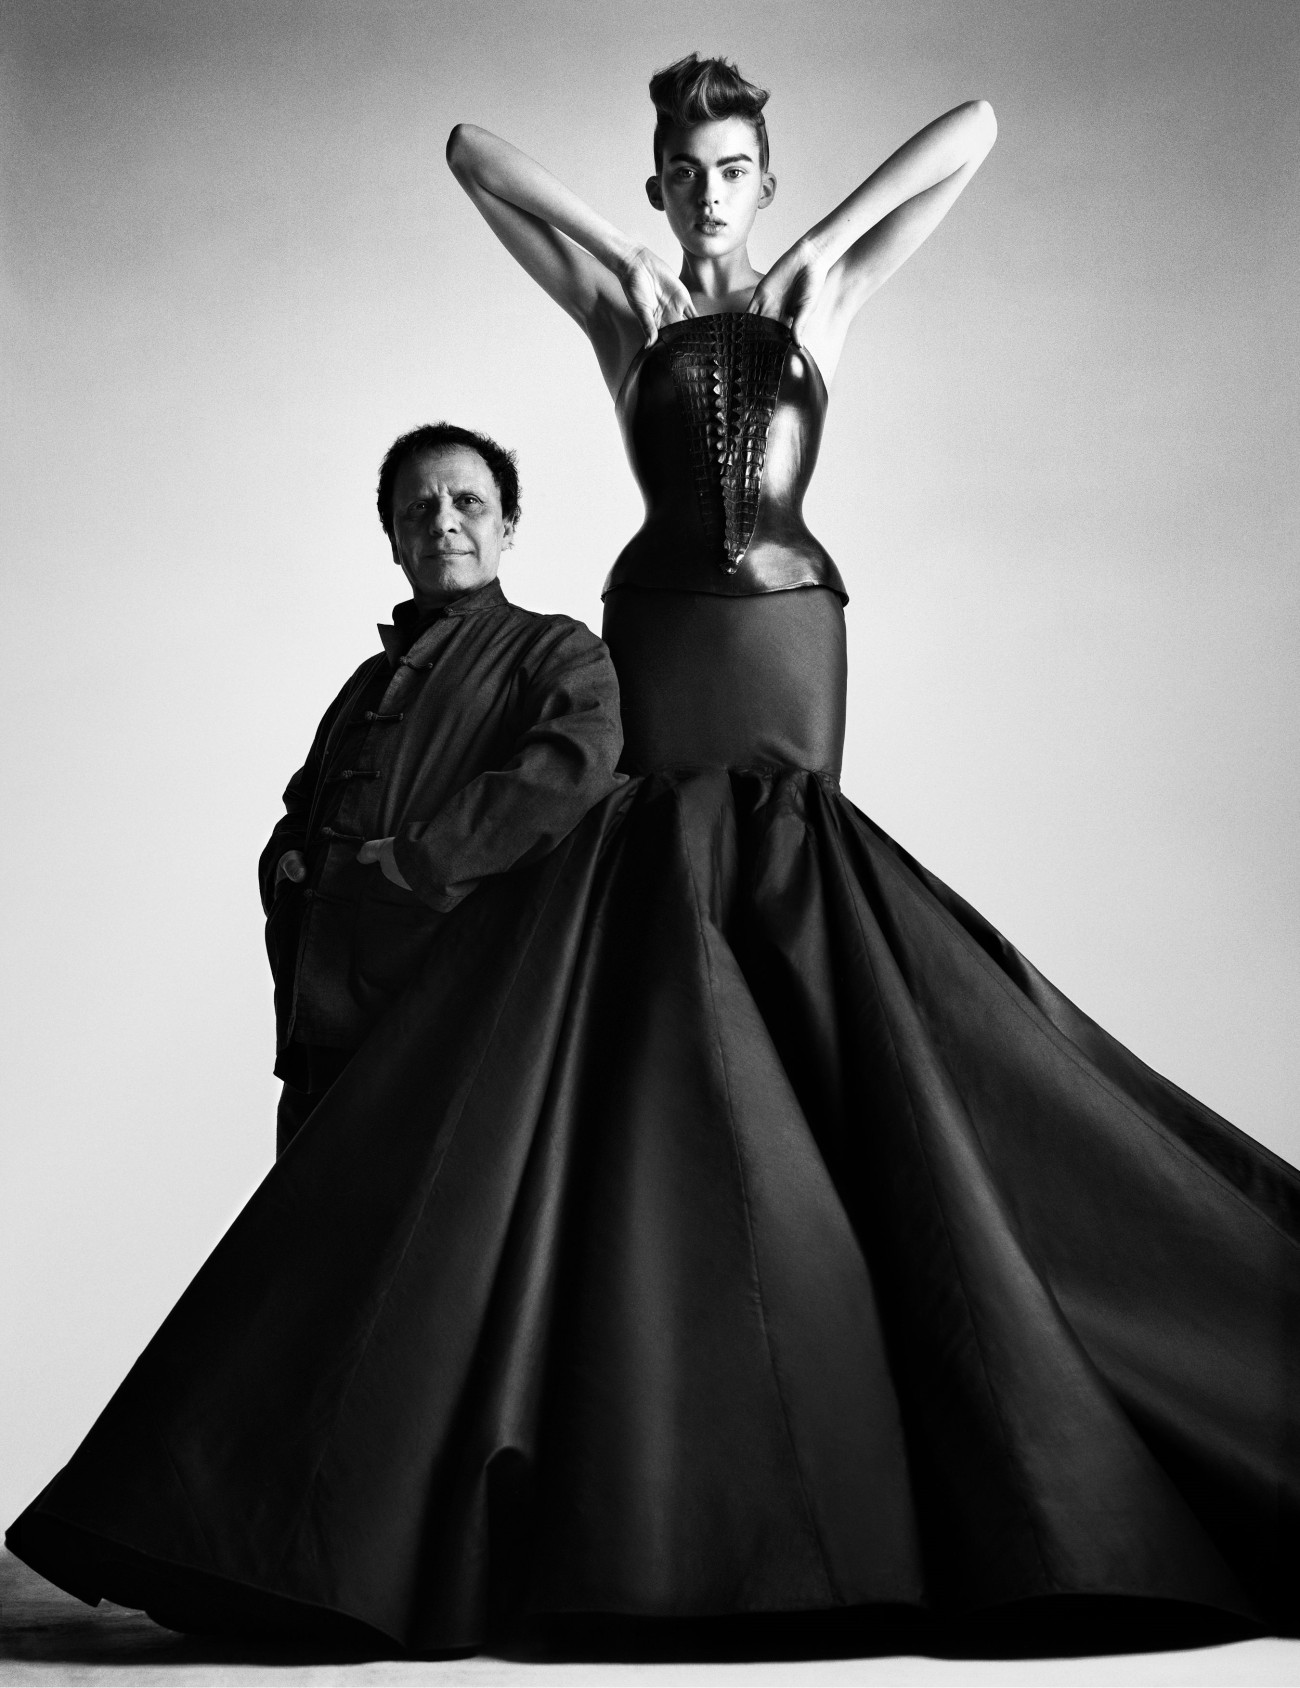 Azzedine_Alaia_Sculpture_Fashion